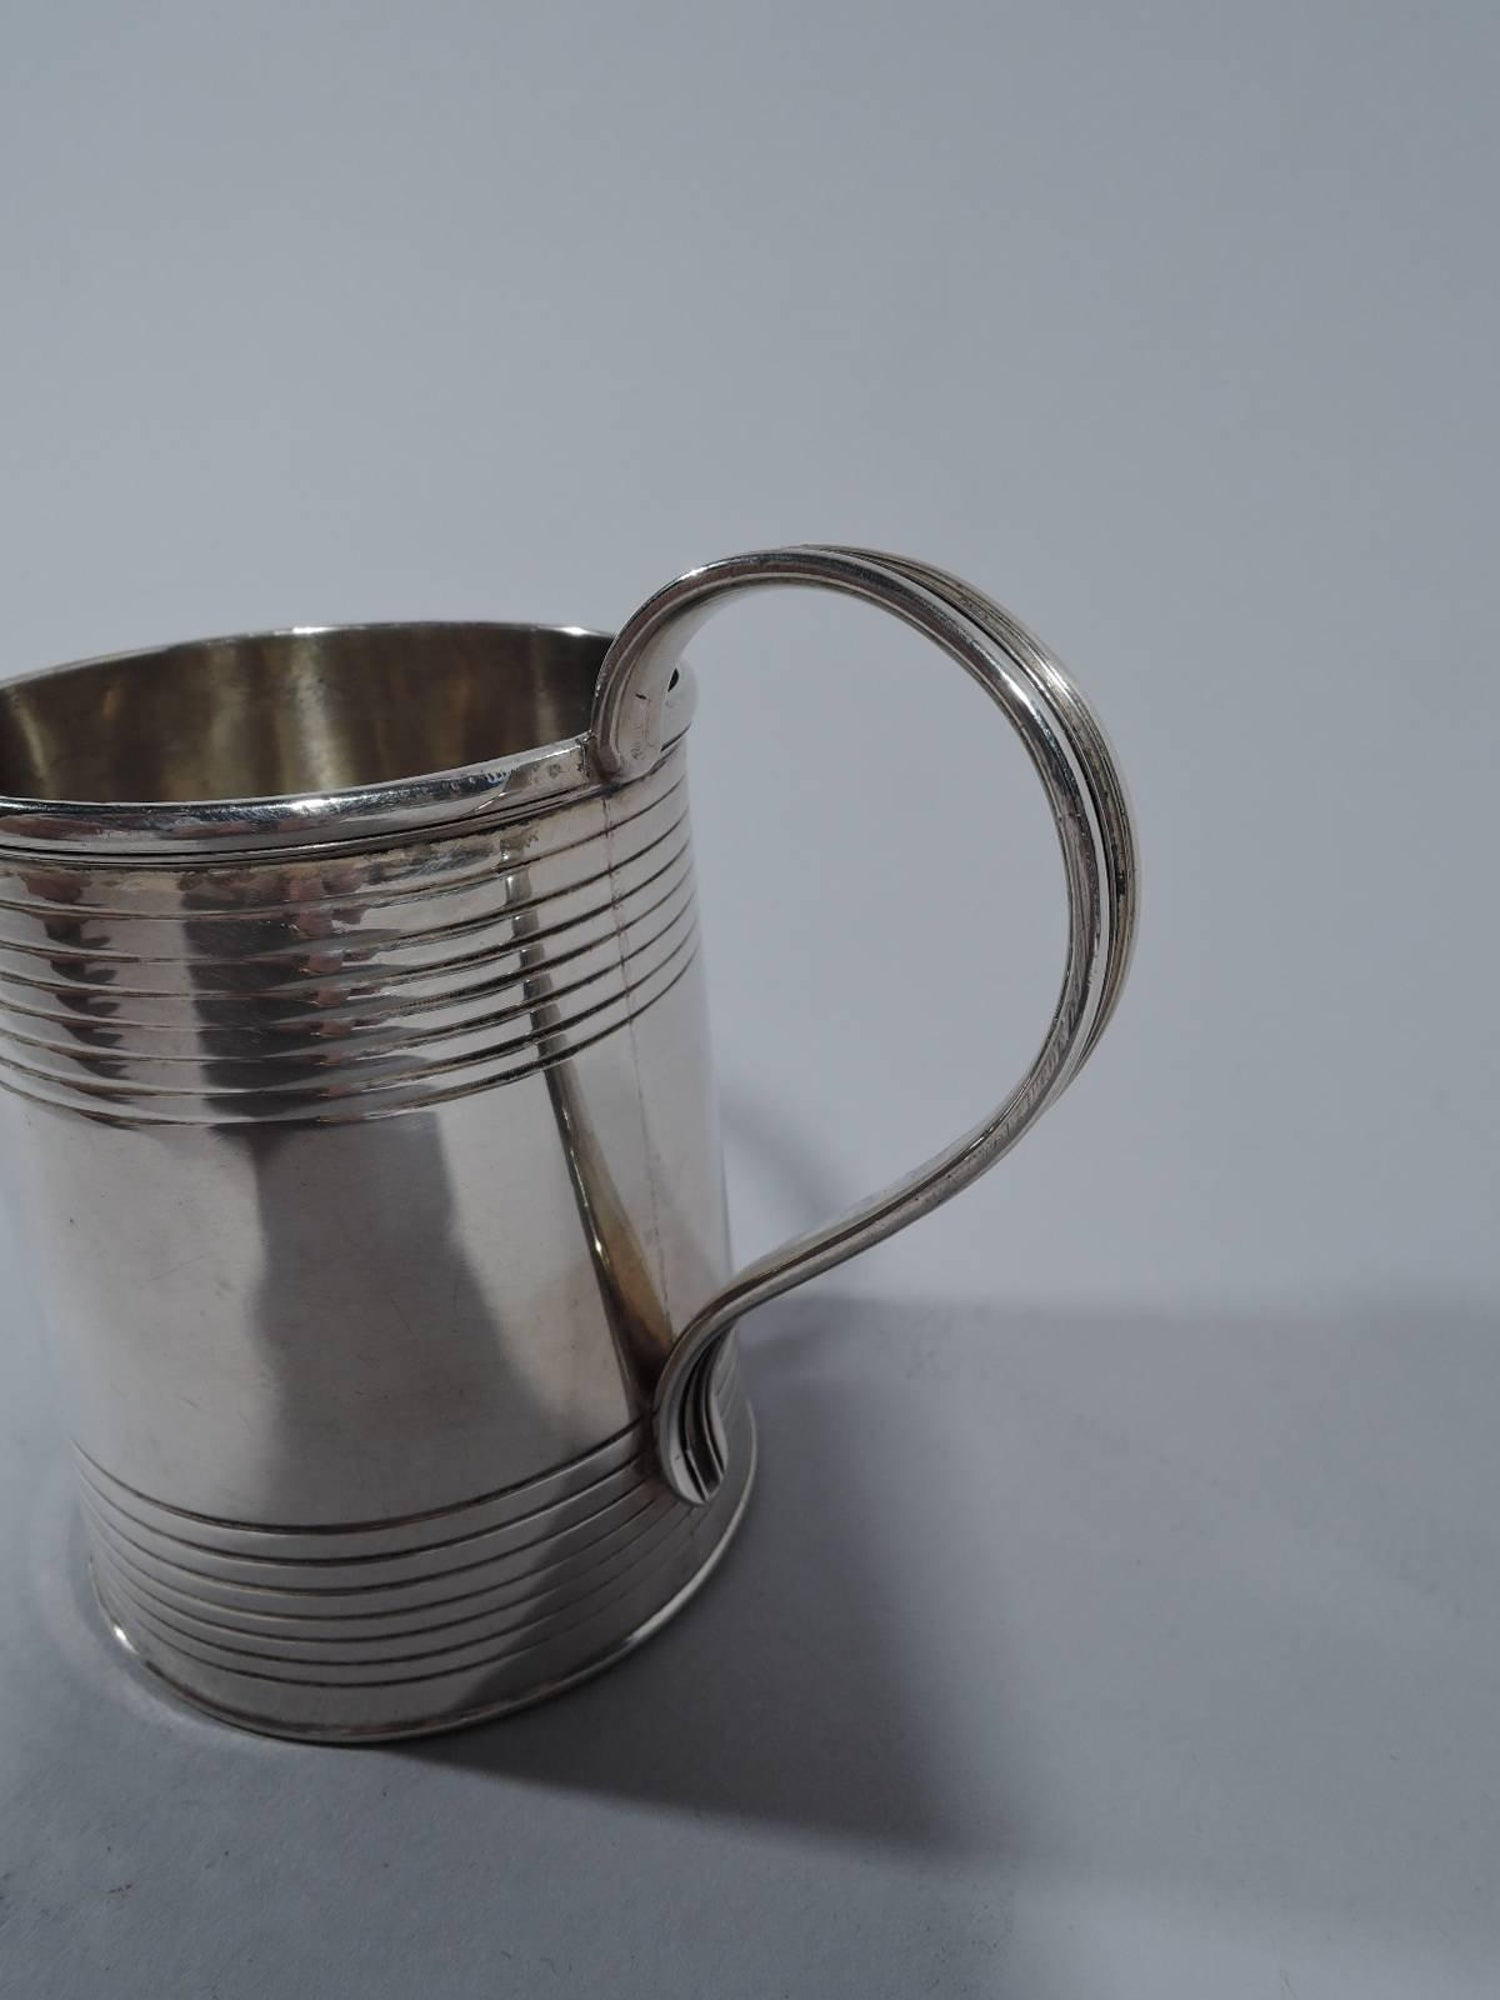 Irish Regency Sterling Silver Tankard Baby Cup by Dublin Maker For ...